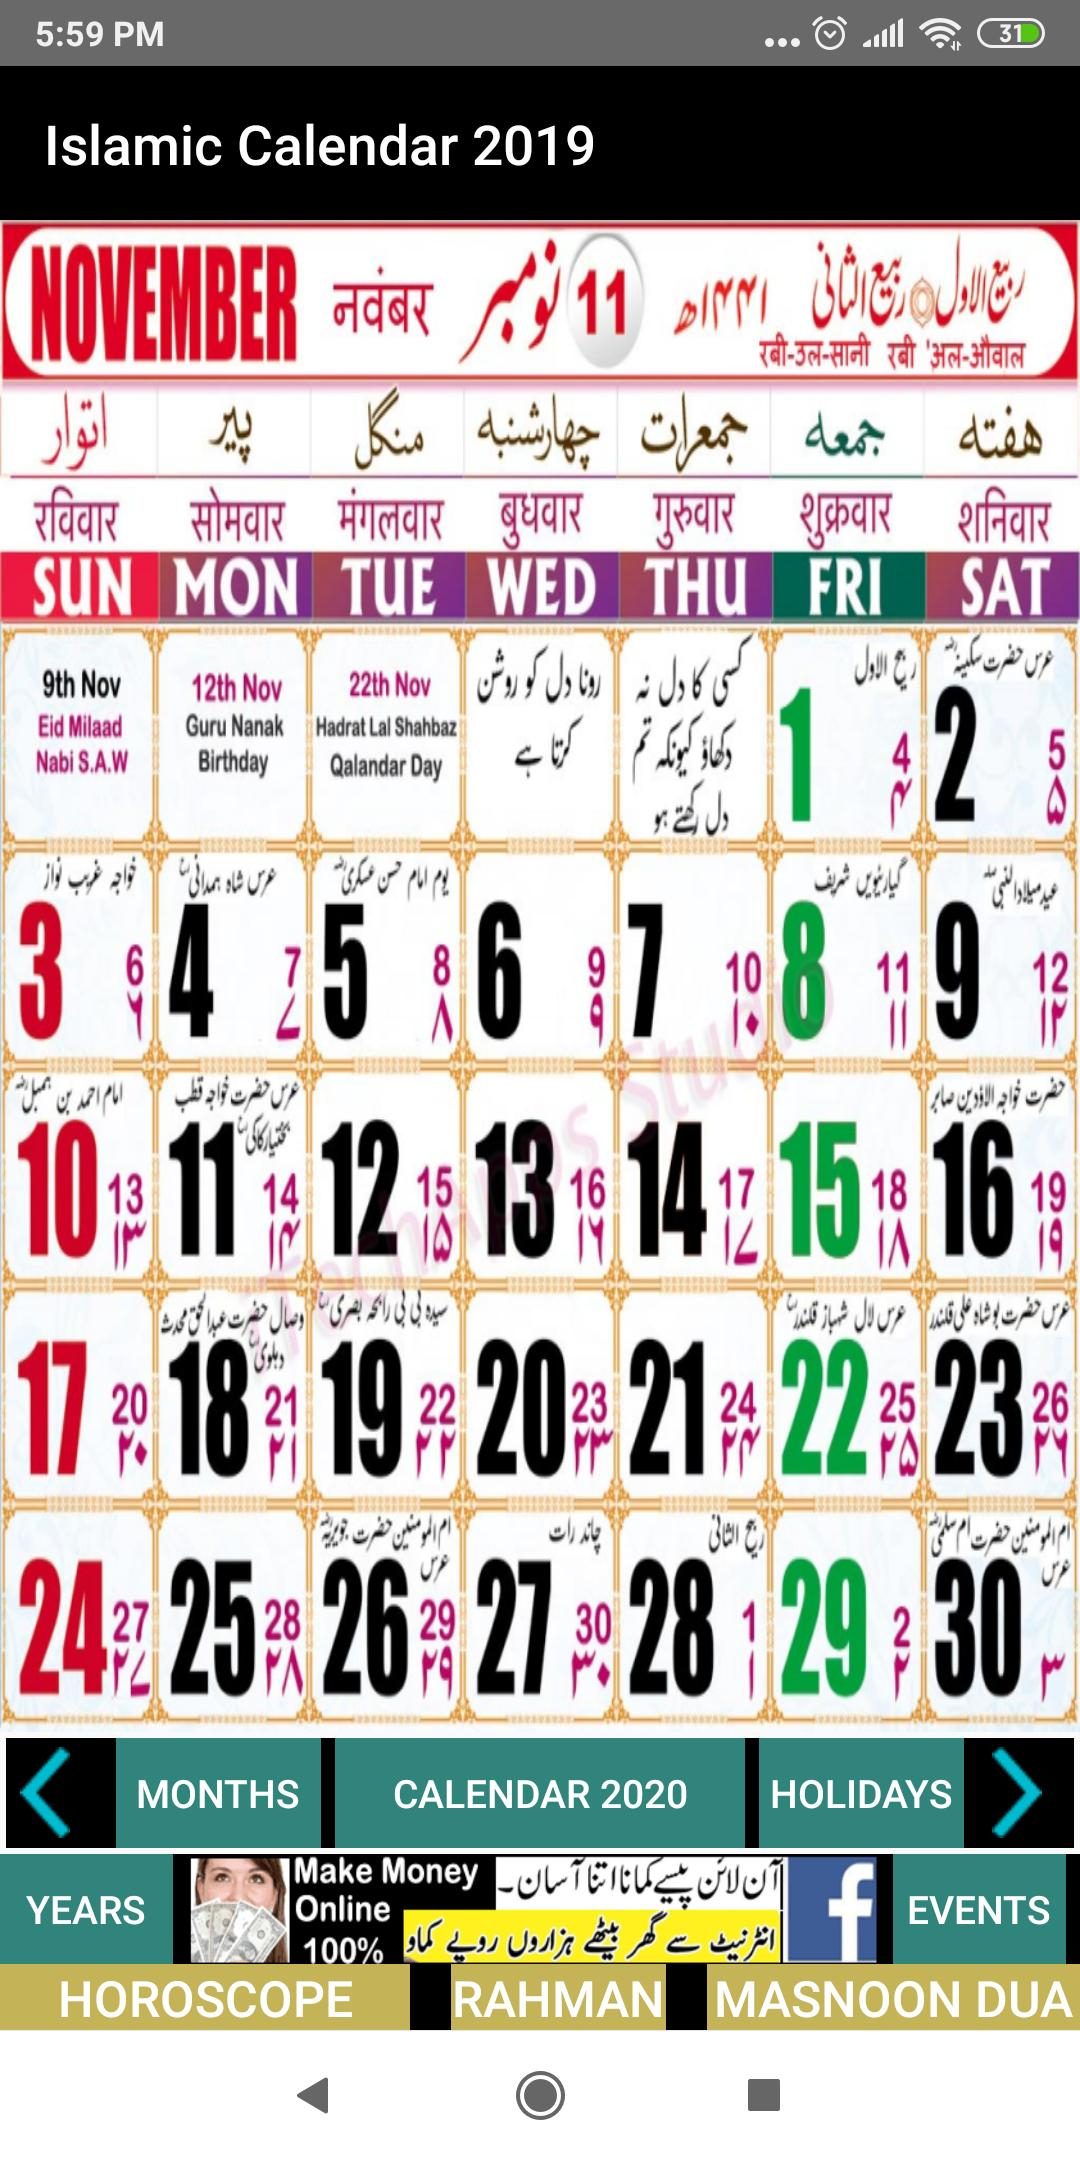 Urdu Calendar 2020 - Islamic Hijri Calendar 2020 Для Андроид